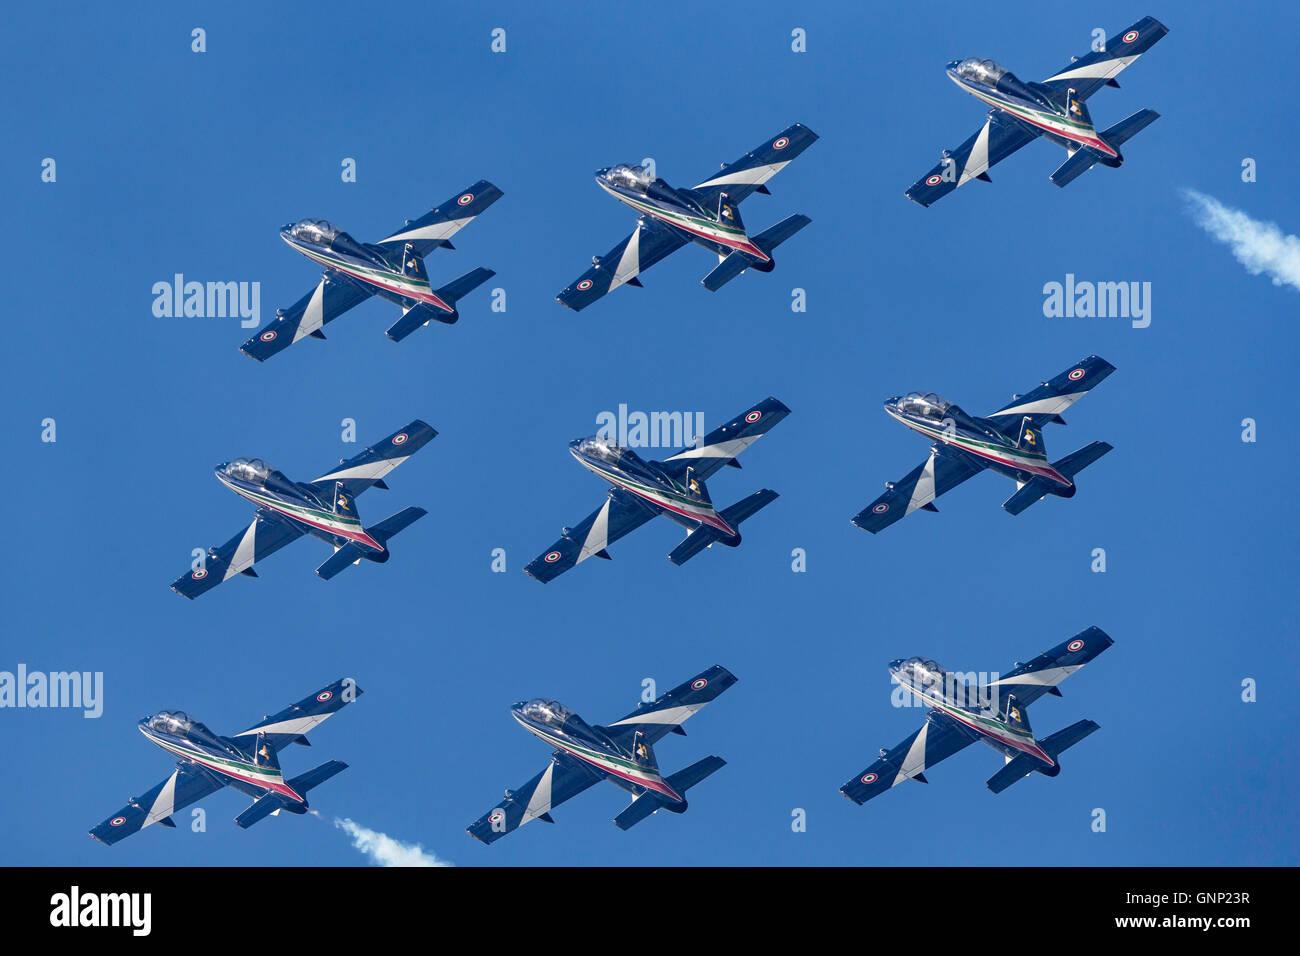 Frecce Tricolori formation aerobatic display team of the Italian Air Force Aeronautica Militare Italiano flying Stock Photo